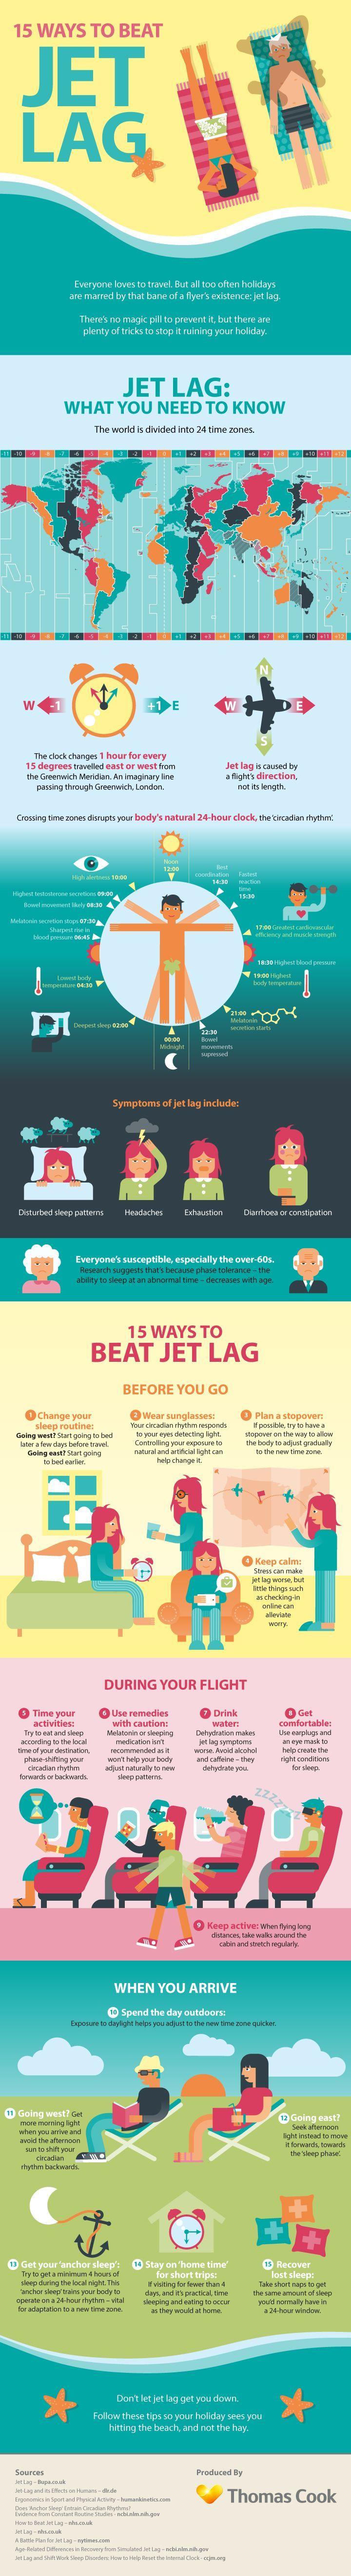 How To Beat Jet Lag - Imgur